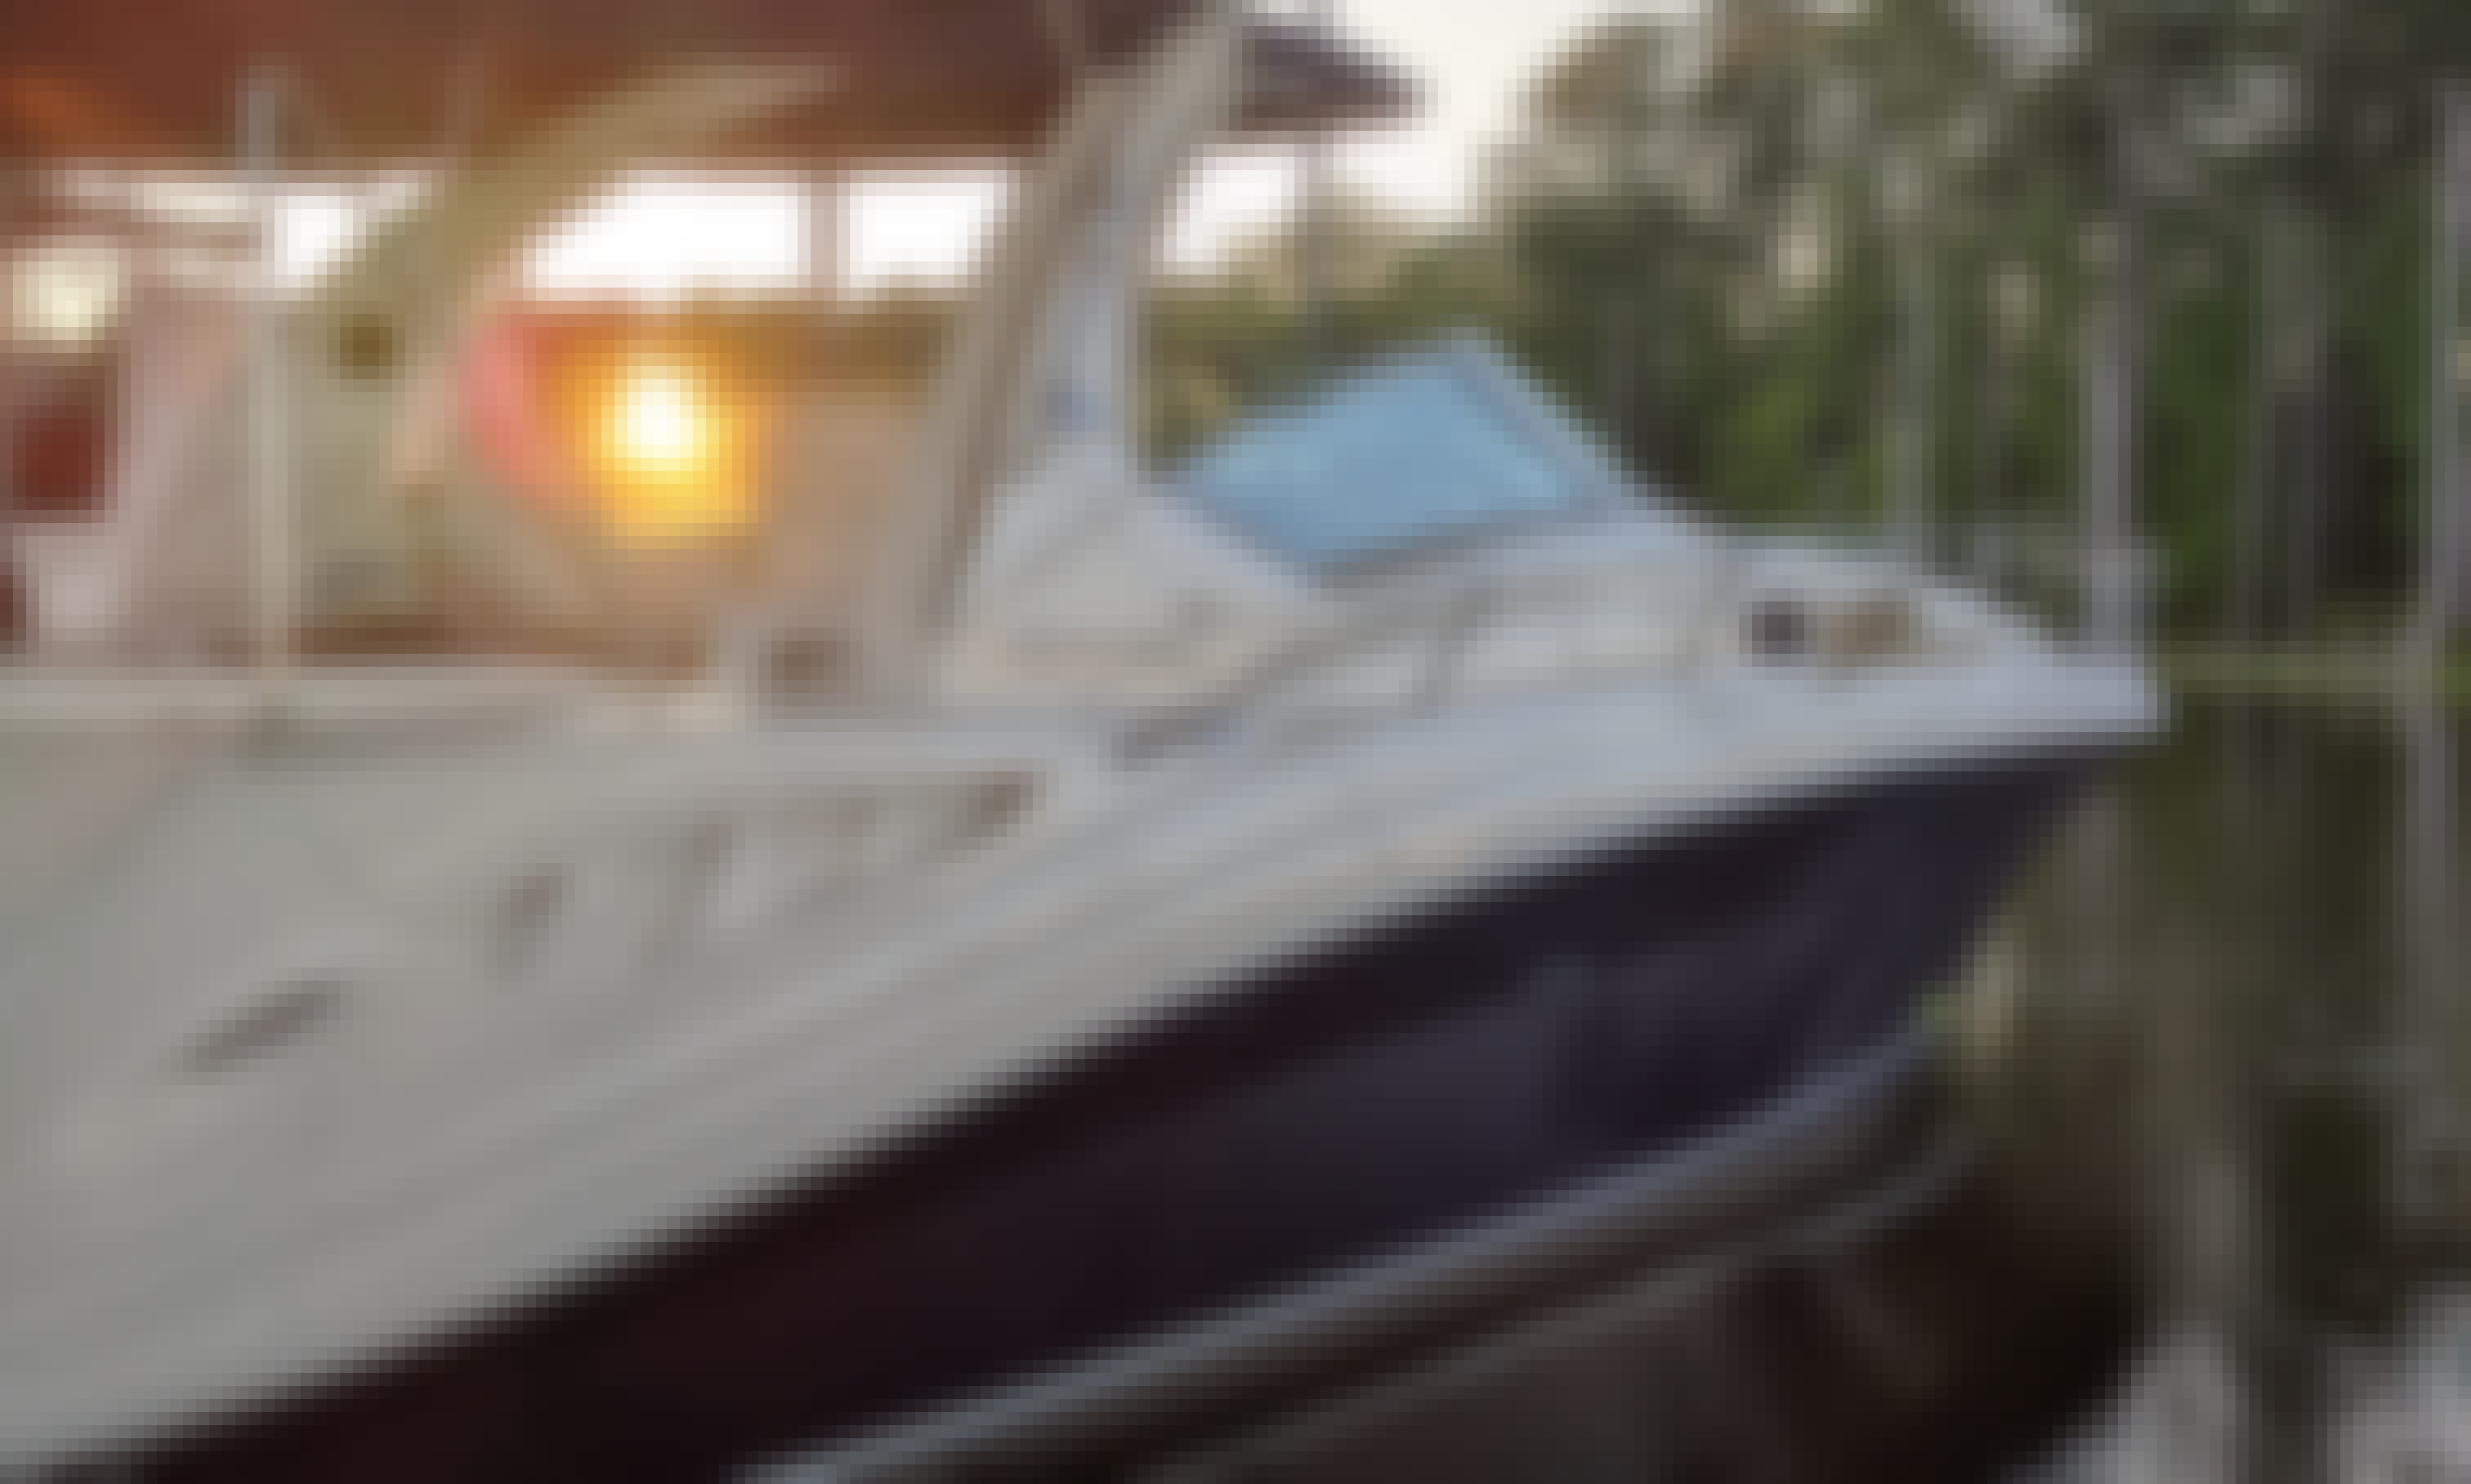 34' SeaRay Luxury Yacht Tours on Beautiful Lake Murray with Captain John